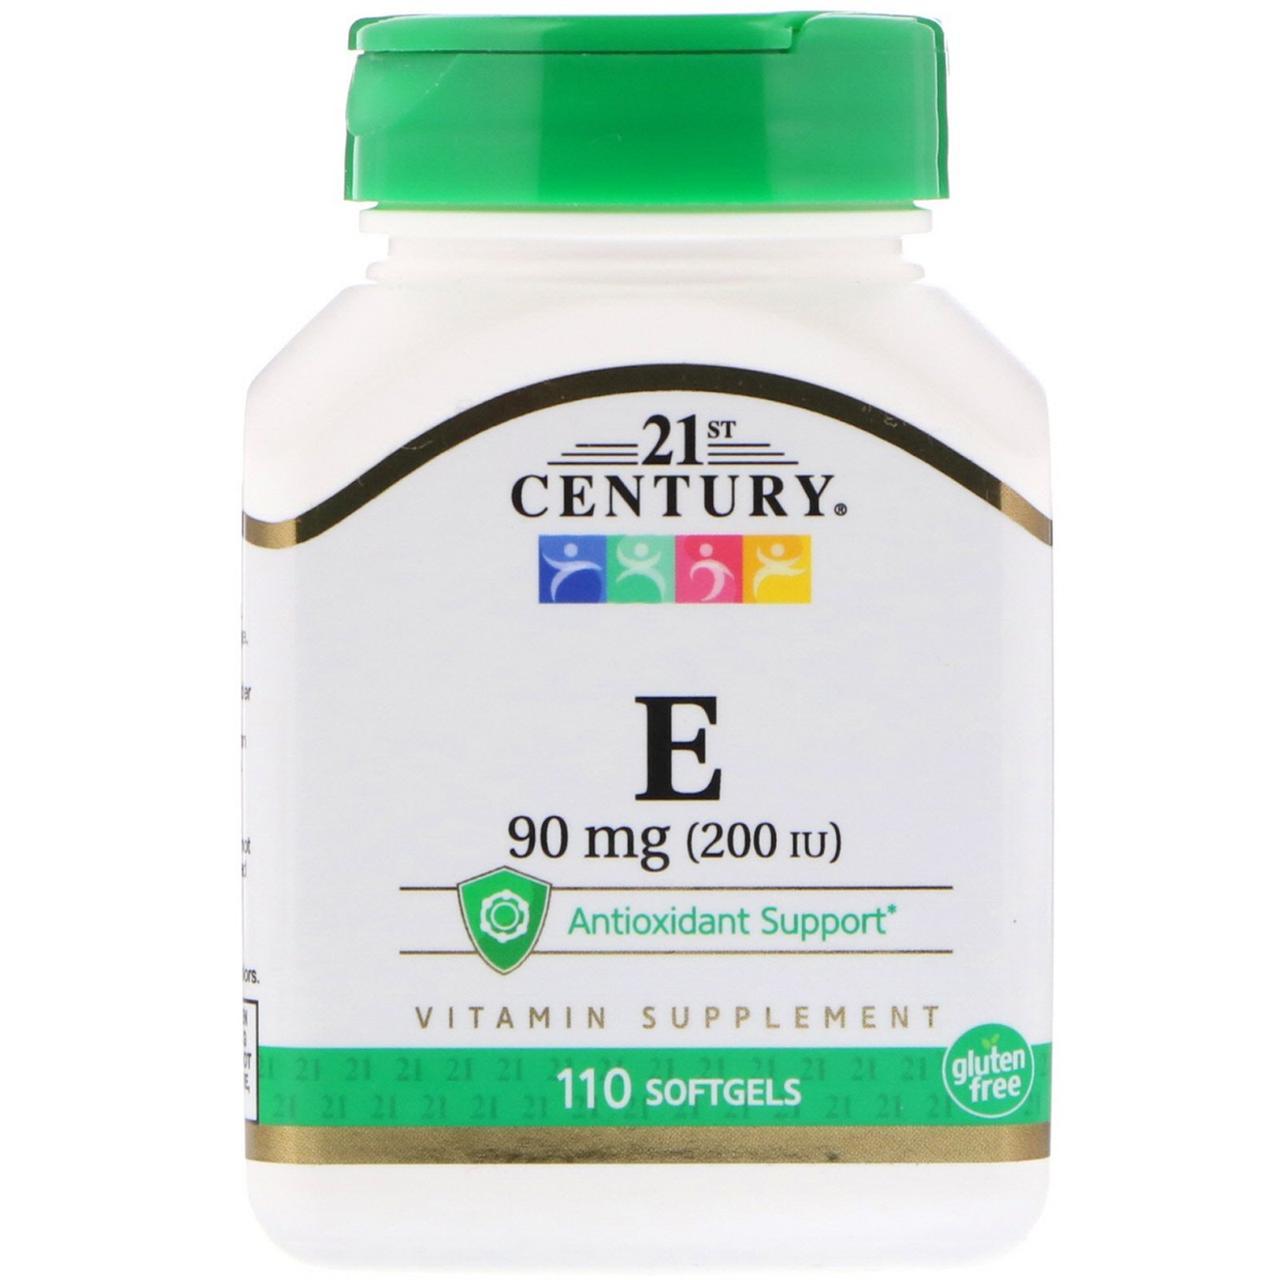 Витамин Е 21st Century Vitamin E 90 mg (200 IU) 21 век